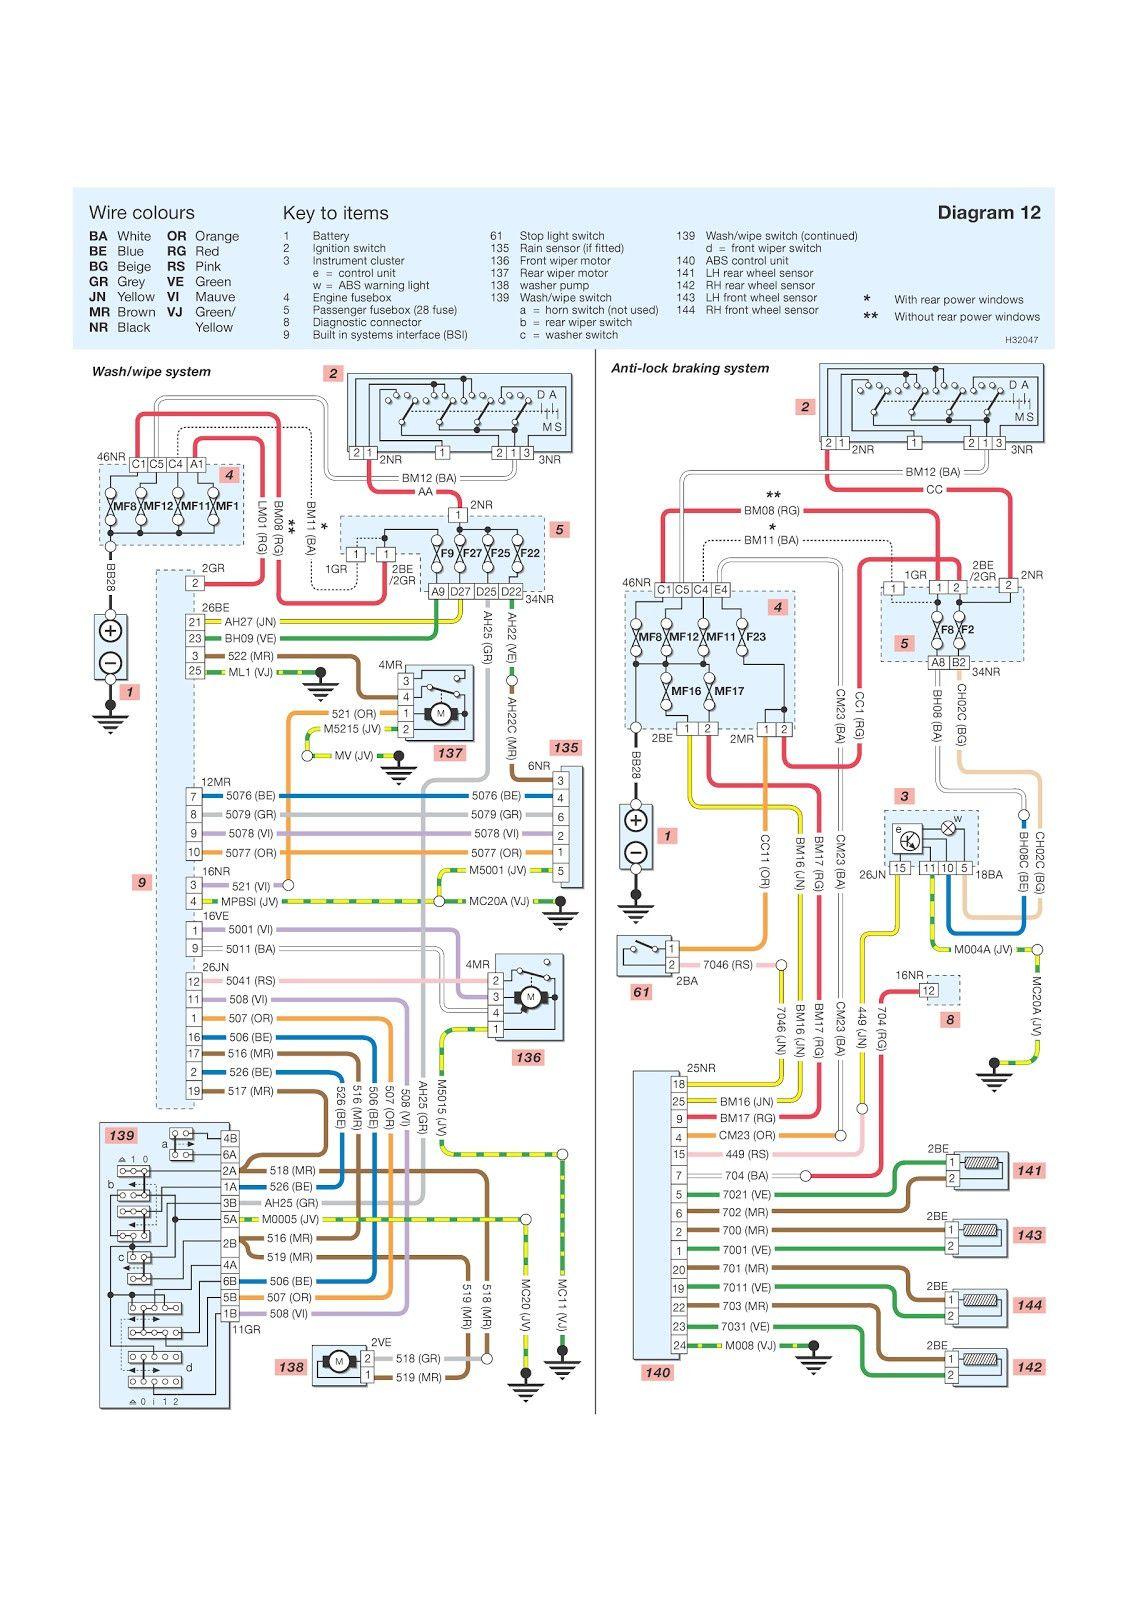 Peugeot 307 Wiring Diagram | Wiring Diagram